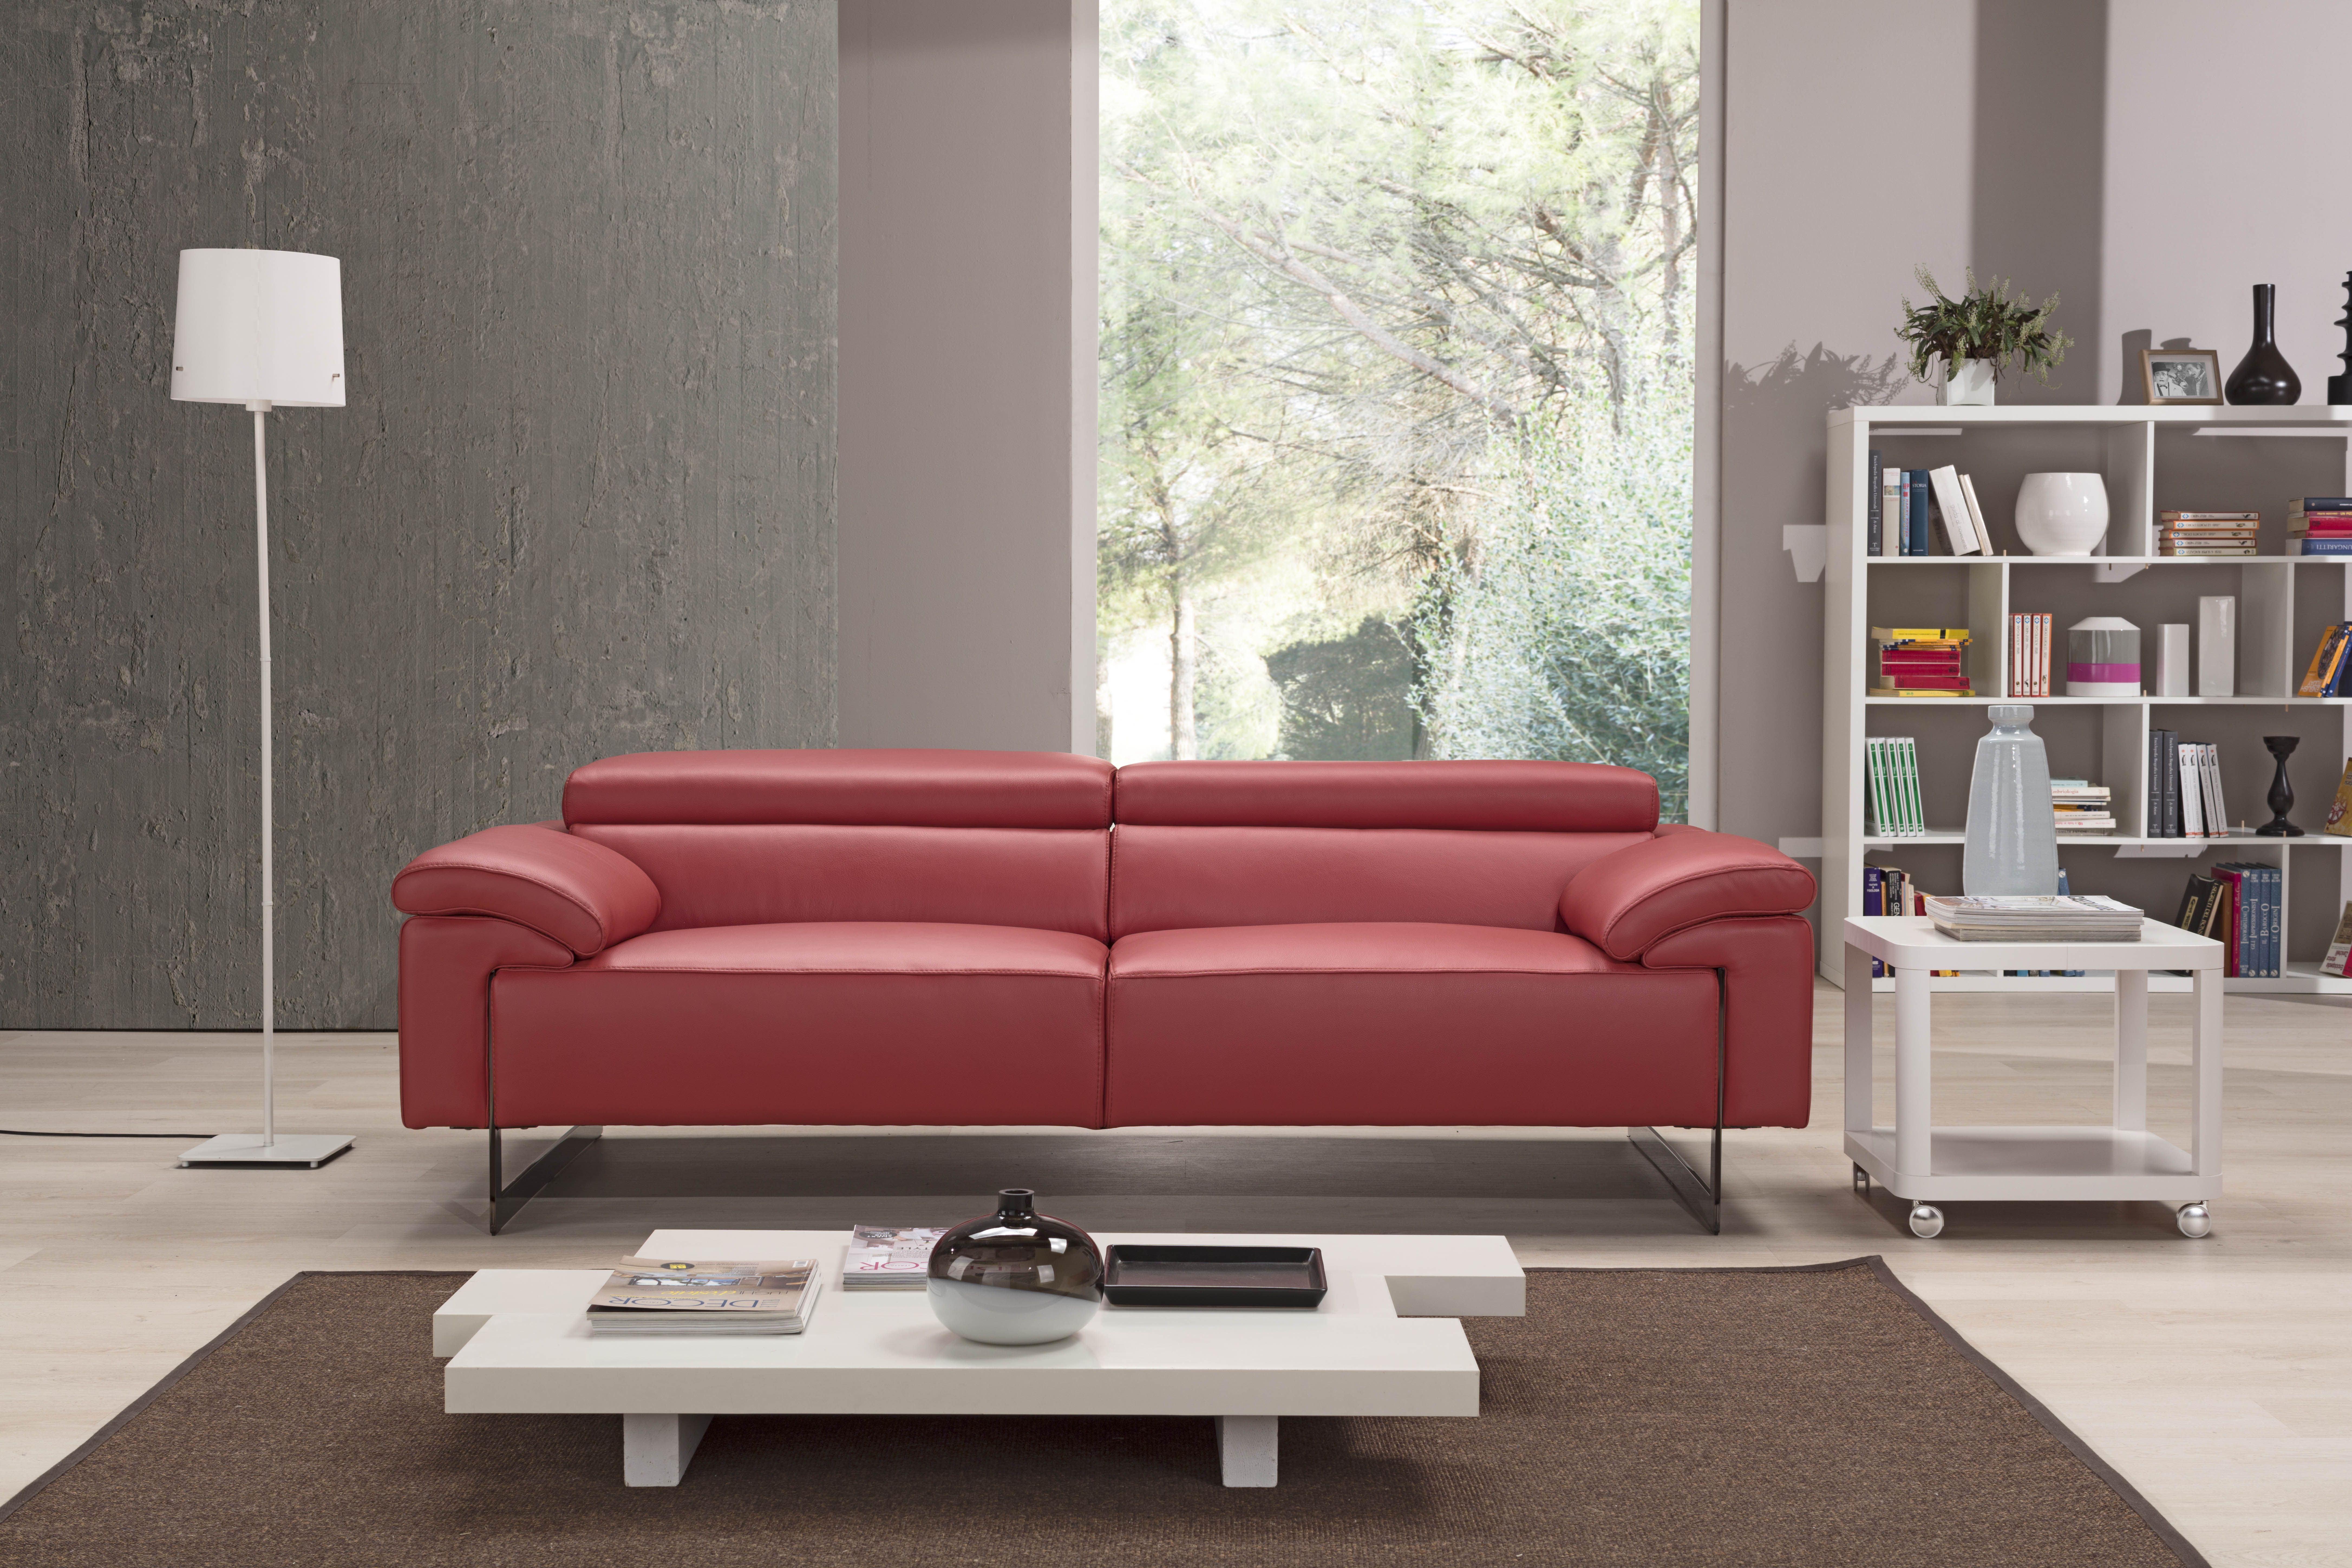 Ecointeriors Ecoexclusive Egoitaliano Couch Italian Design Dublin Santry Dunlaoghaire With Images Design Interior Design Interior